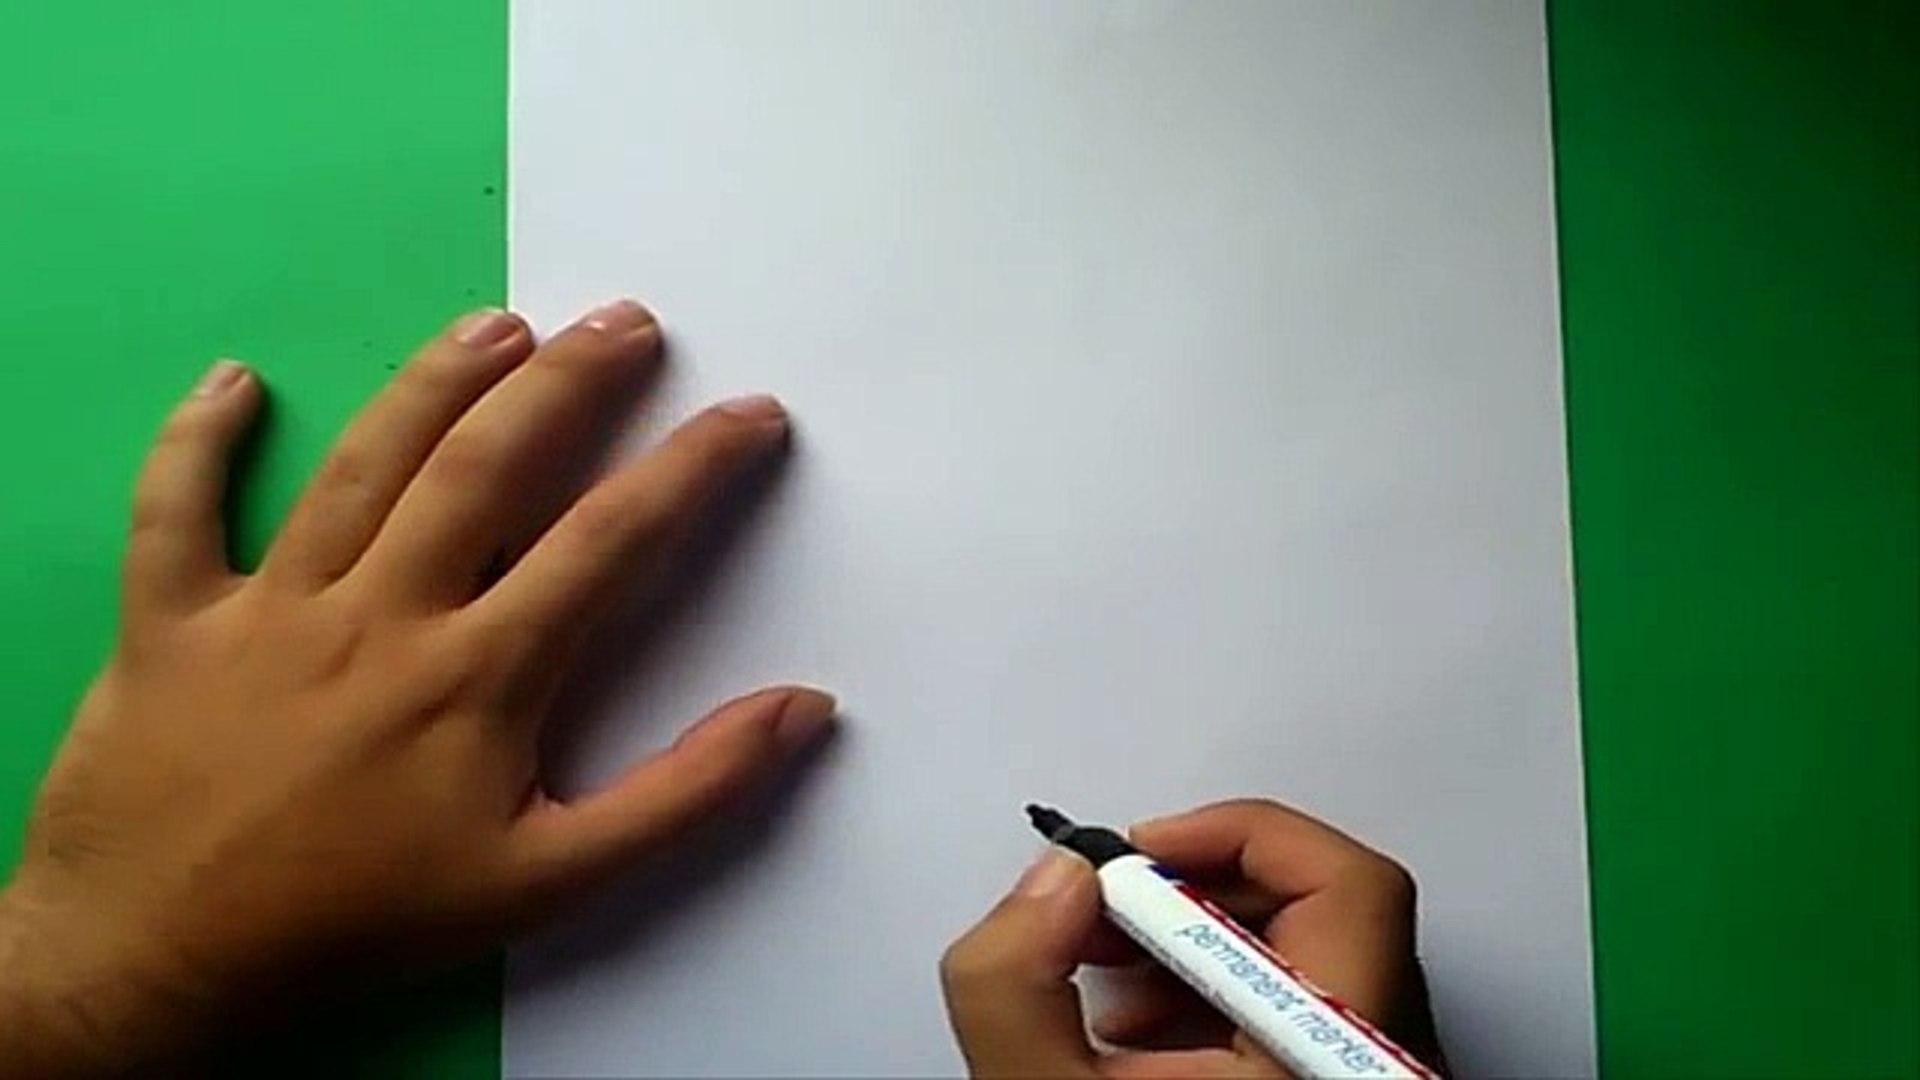 Como dibujar a Bugs Bunny paso a paso - Looney Tunes   How to draw Bugs Bunny - Looney Tunes